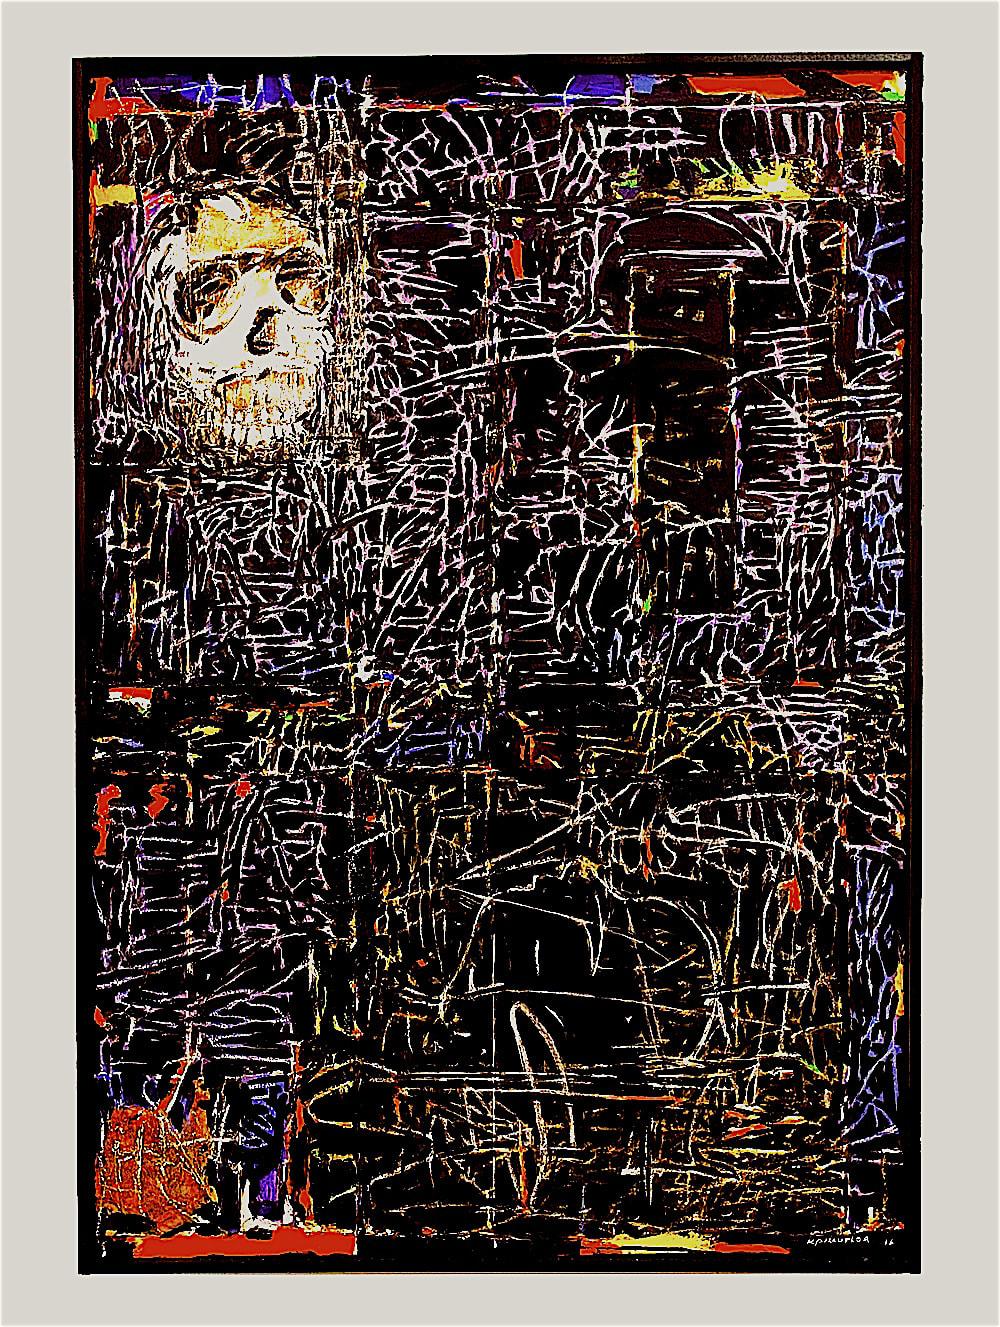 <span class=&#34;link fancybox-details-link&#34;><a href=&#34;/artworks/categories/121/3236-kagiso-pat-mautloa-homo-naledi-2016/&#34;>View Detail Page</a></span><div class=&#34;artist&#34;><strong>Kagiso Pat Mautloa</strong></div> <div class=&#34;title&#34;><em>Homo Naledi</em>, 2016</div> <div class=&#34;medium&#34;>Acrylic On Canvas</div> <div class=&#34;dimensions&#34;>120cm x 80cm</div><div class=&#34;price&#34;>R122,635.00</div>